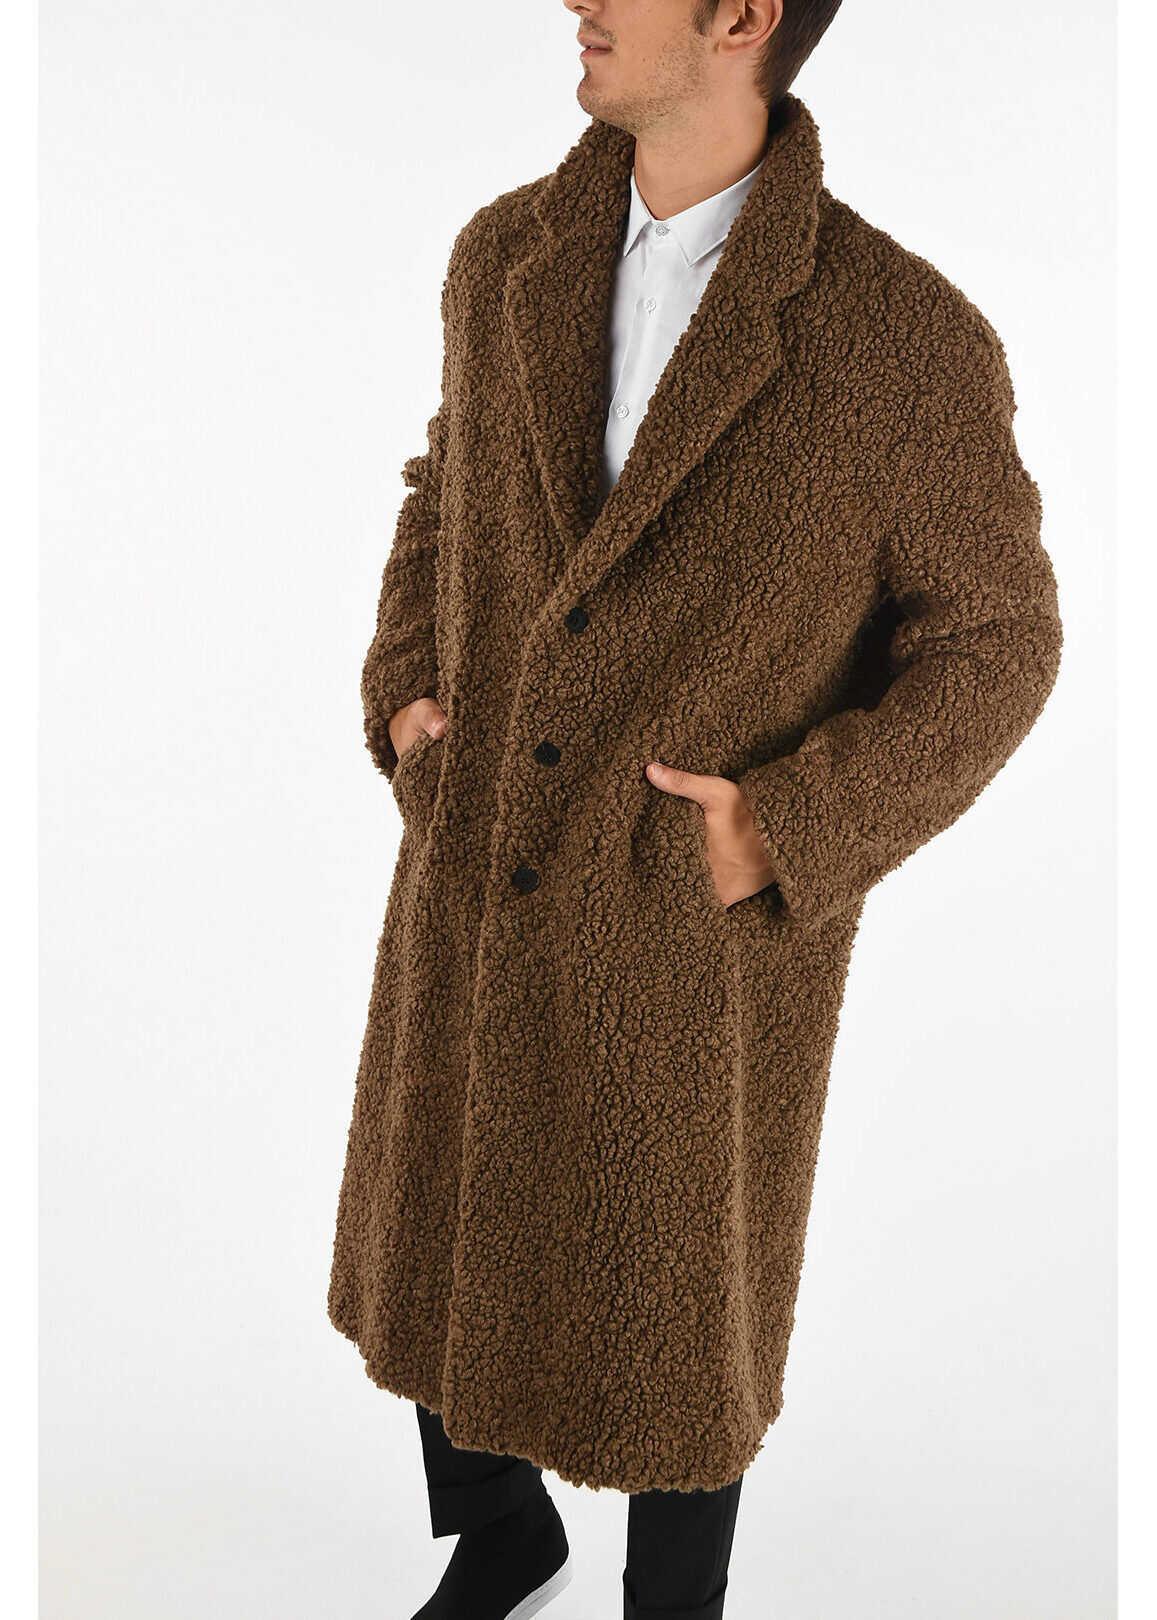 Neil Barrett Faux Fur Slim Fit Coat BROWN imagine